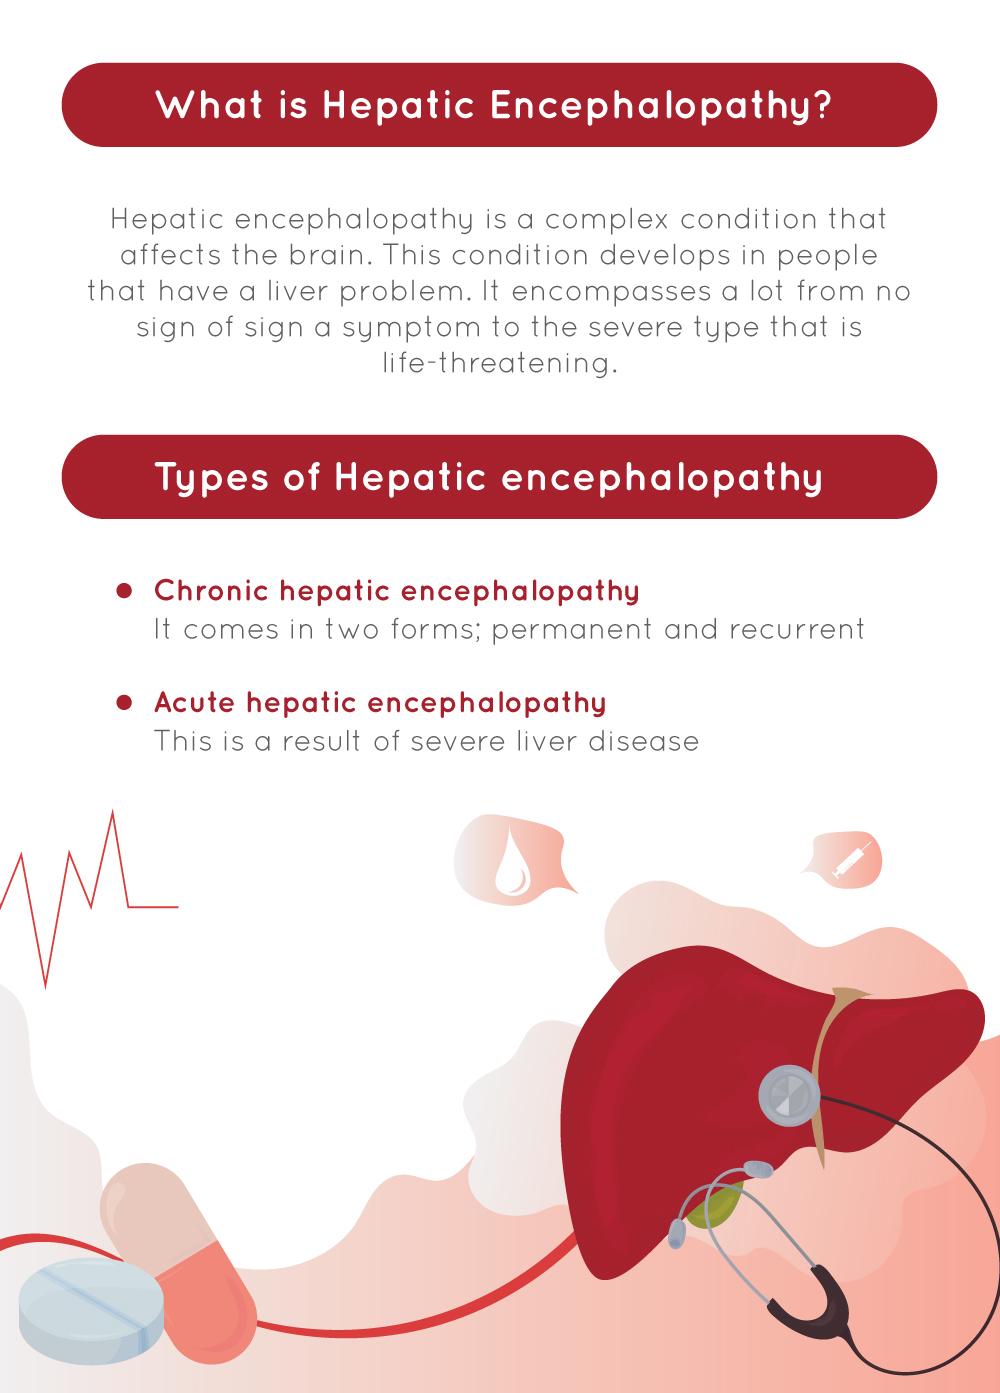 What is Hepatic Encephalopathy?